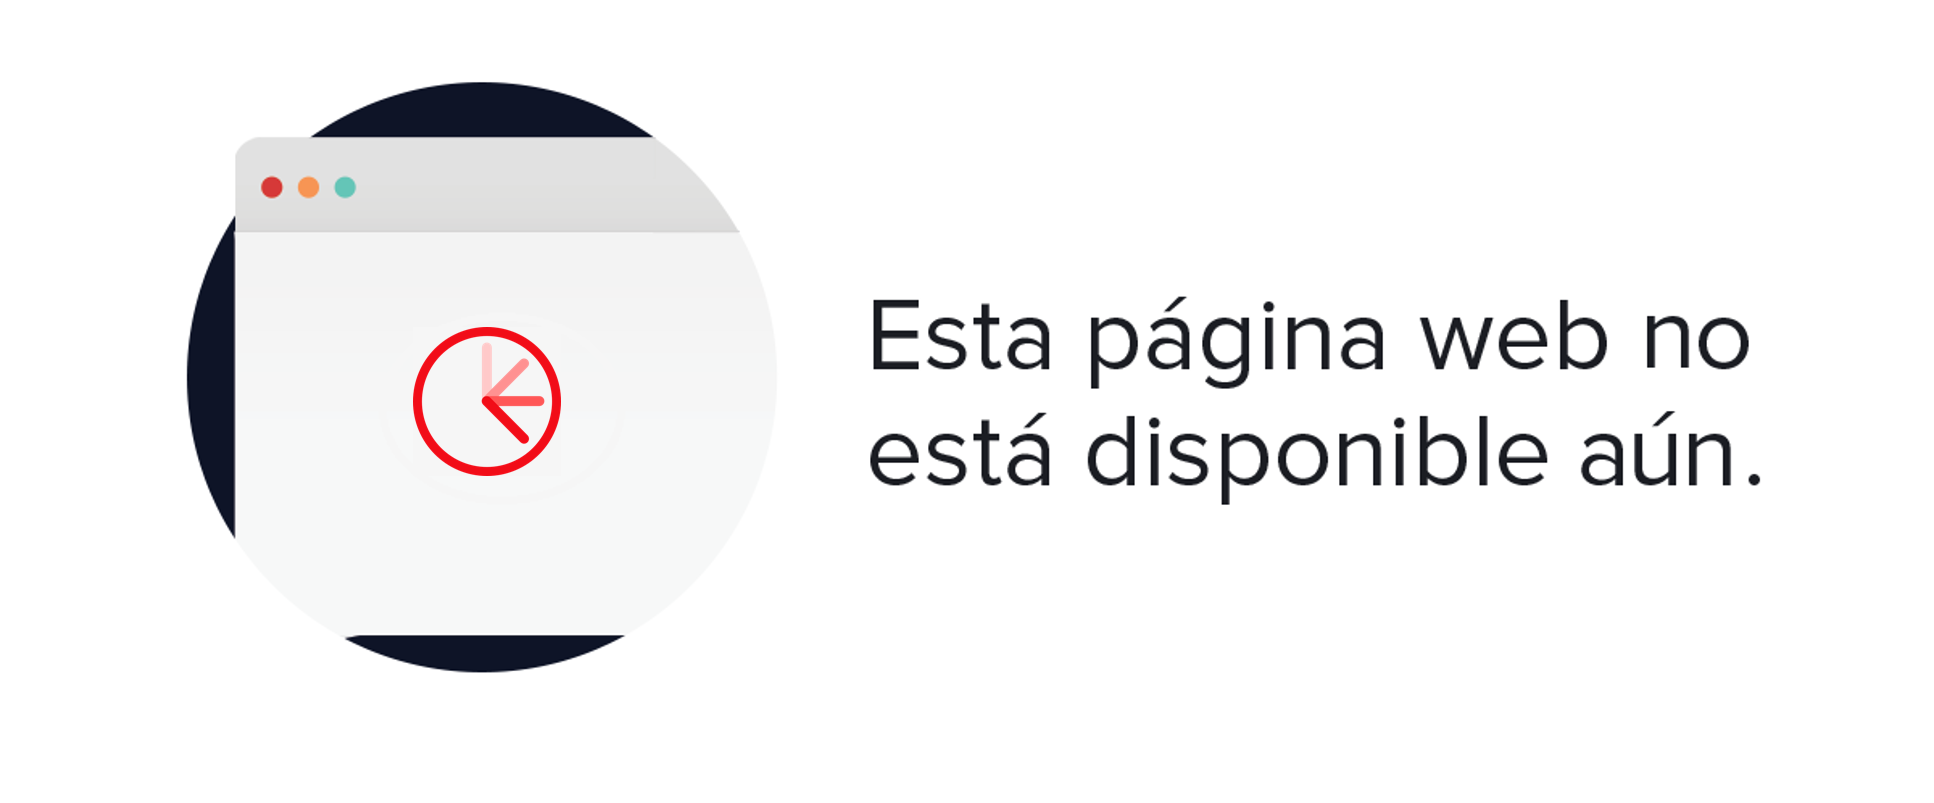 new balance 574 mujer negro oro ESqgsgn Vendo Argentina d0babda444c13